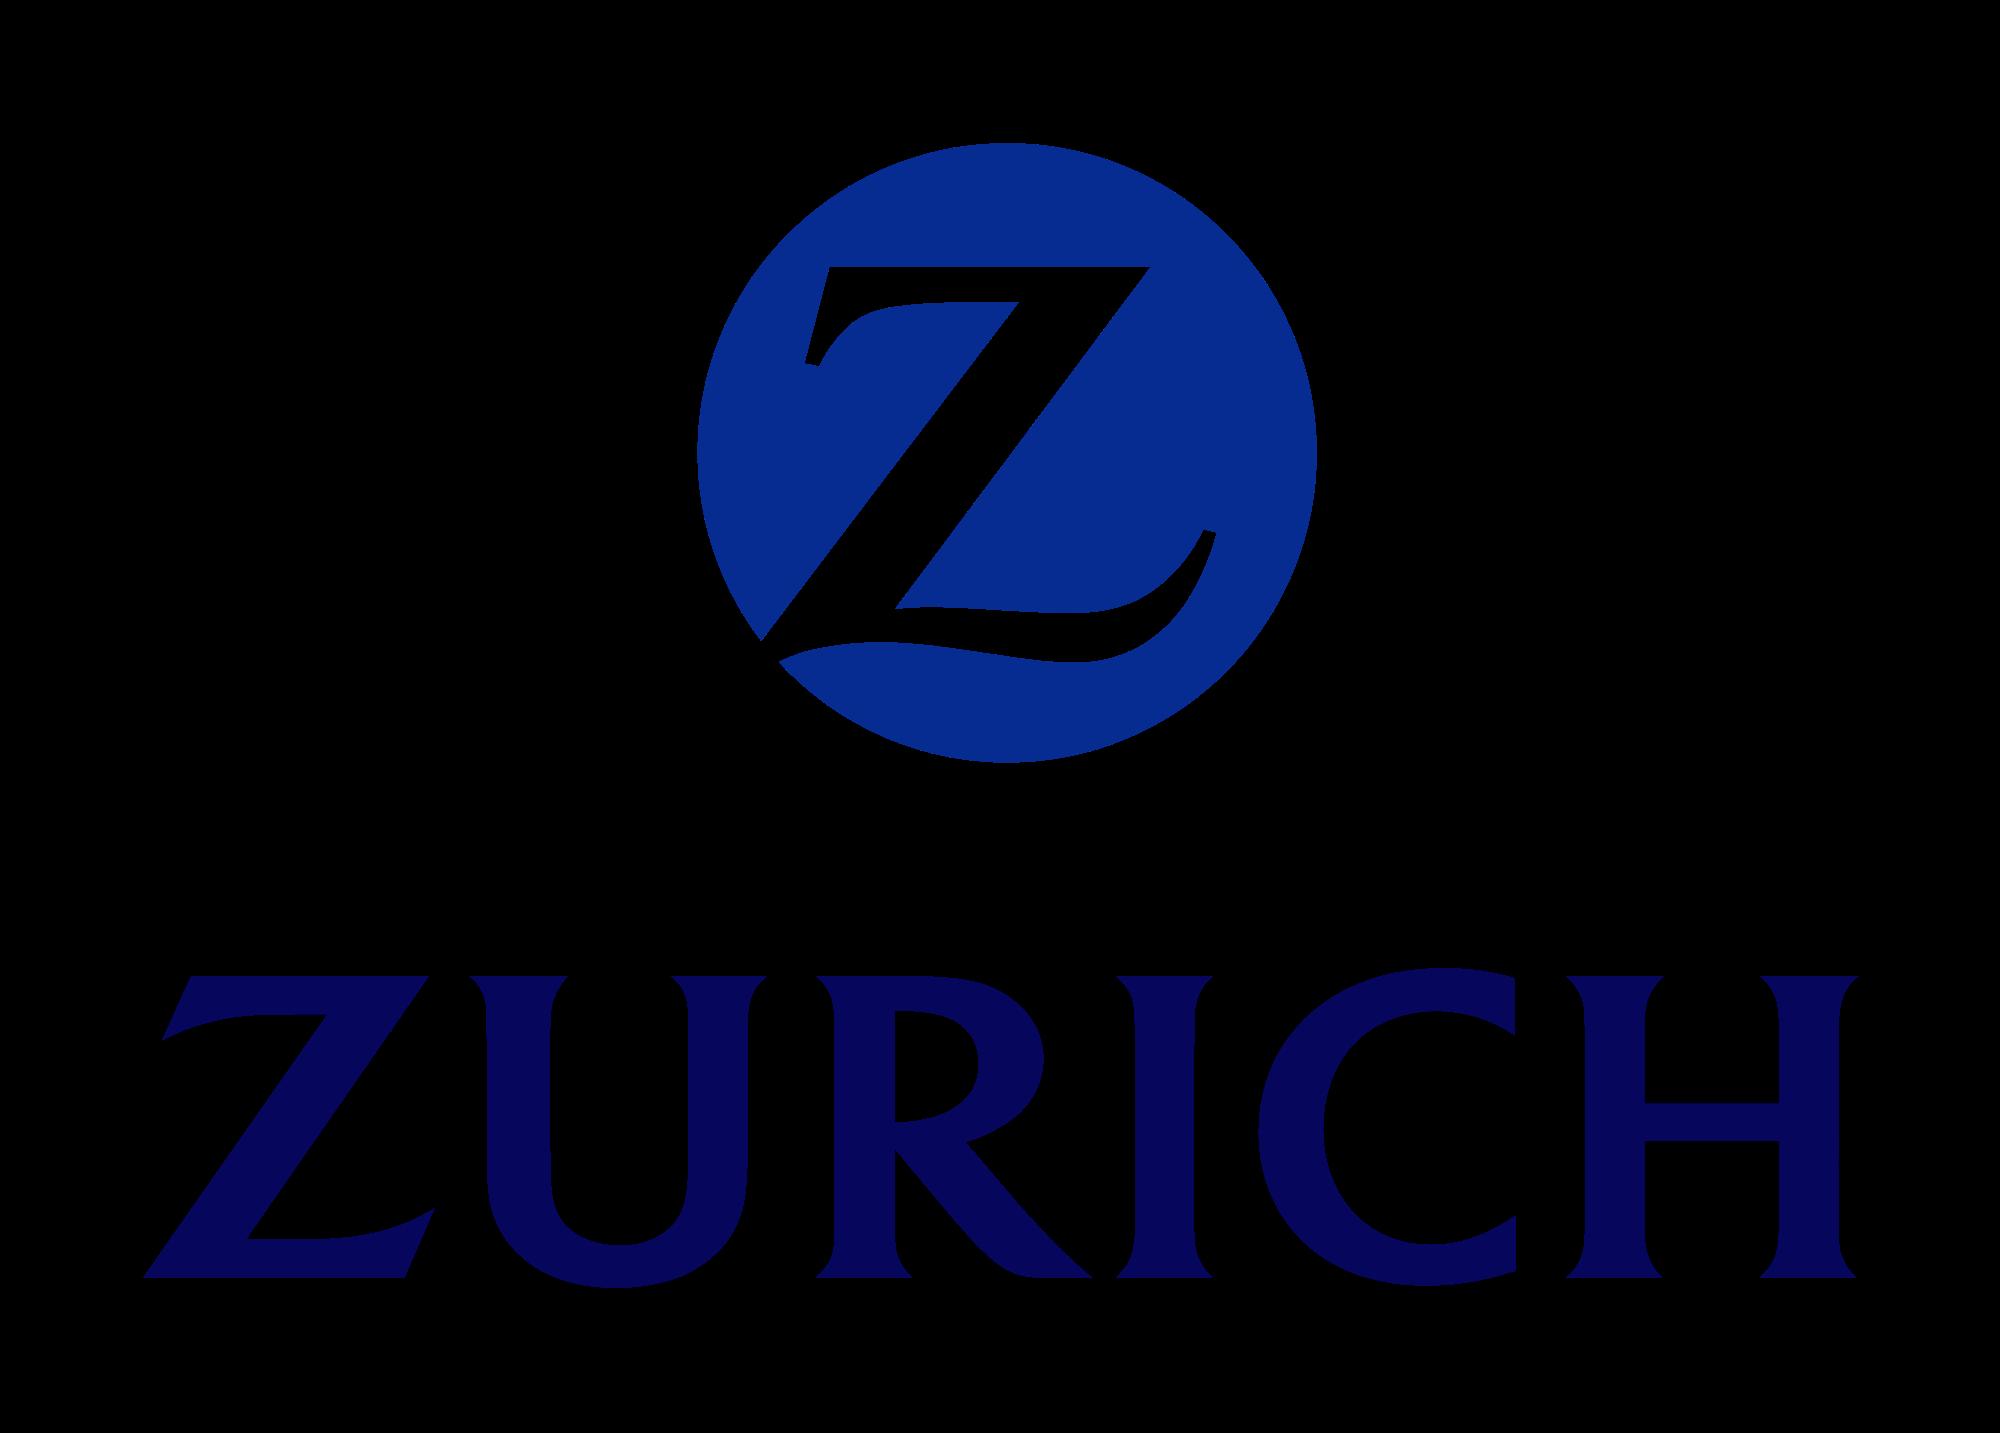 Zurich_Logo_new_svg.png